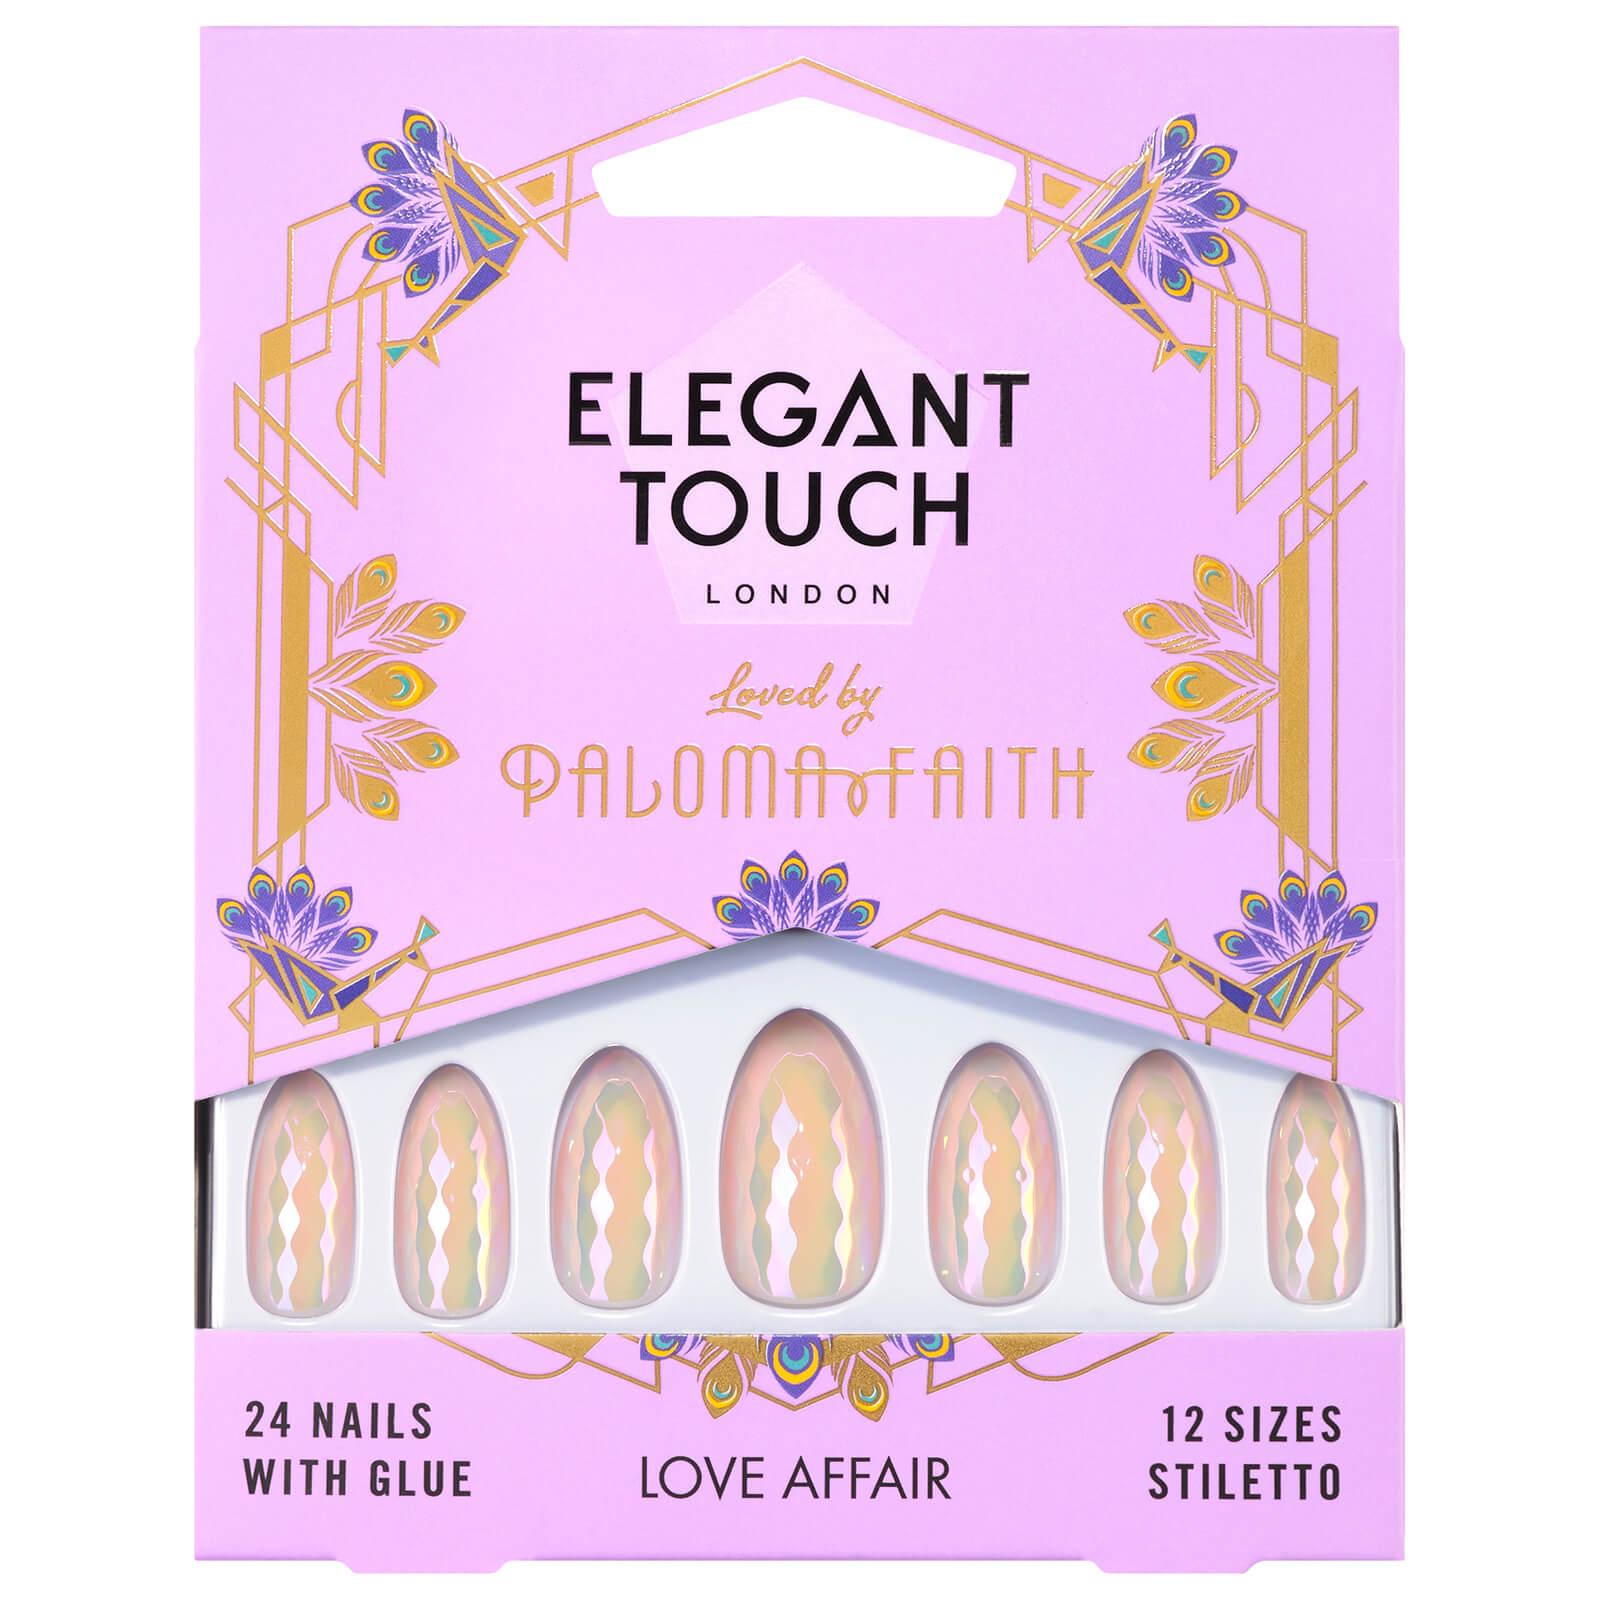 Купить Elegant Touch X Paloma Faith Nails - Love Affair